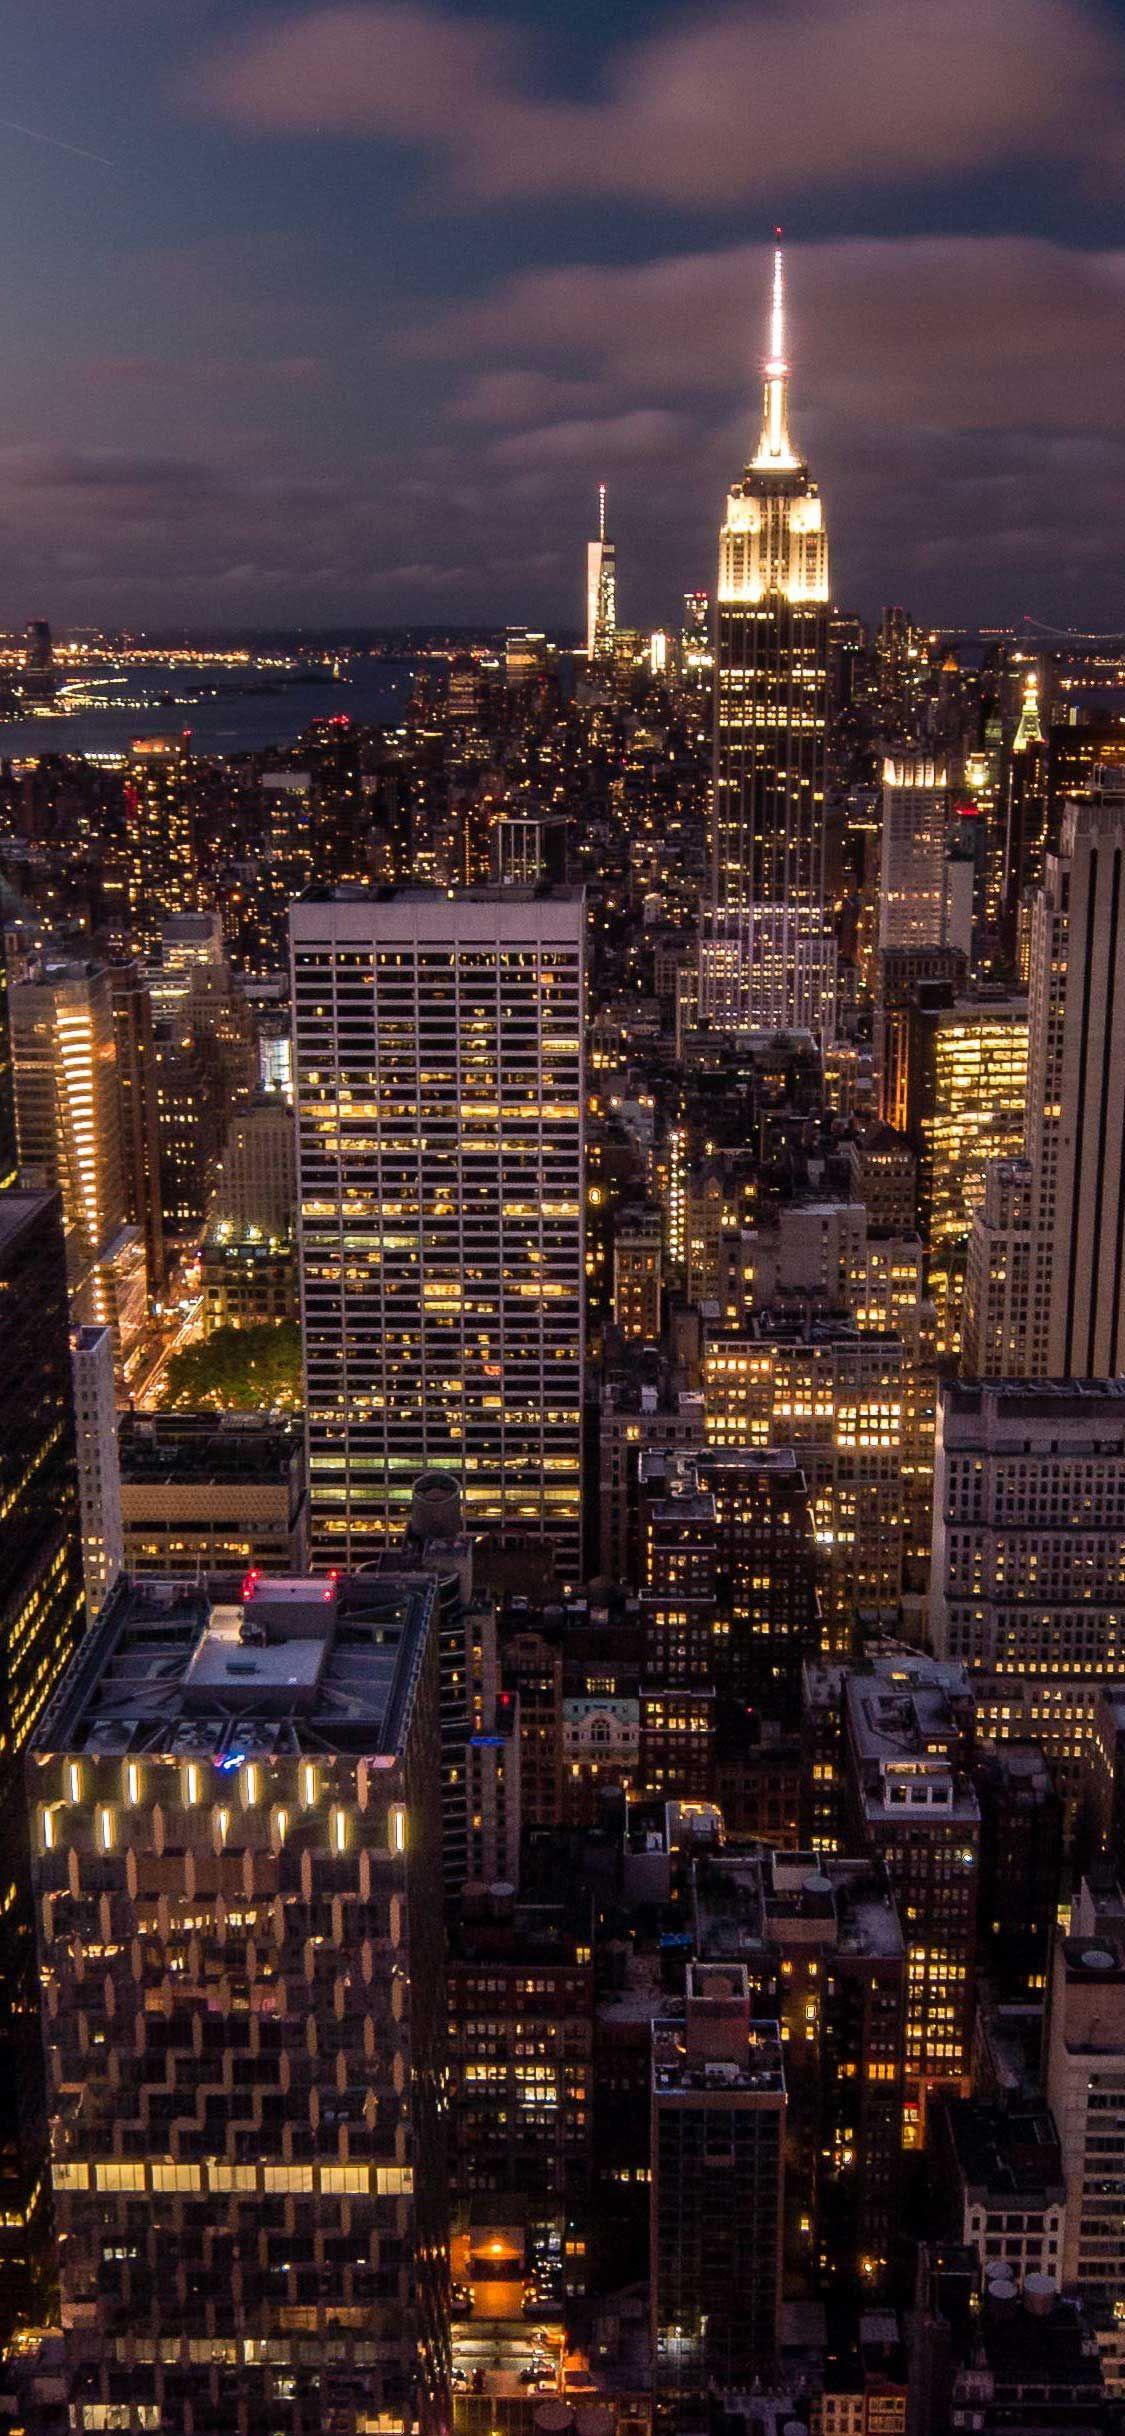 Iphone Wallpaper Nyc Bird S Eye View Skyscrapers Rockefeller Center Wallpaper Hd Iphone Wallpaper Nyc Nyc Wallpaper Iphone Wallpaper Eyes